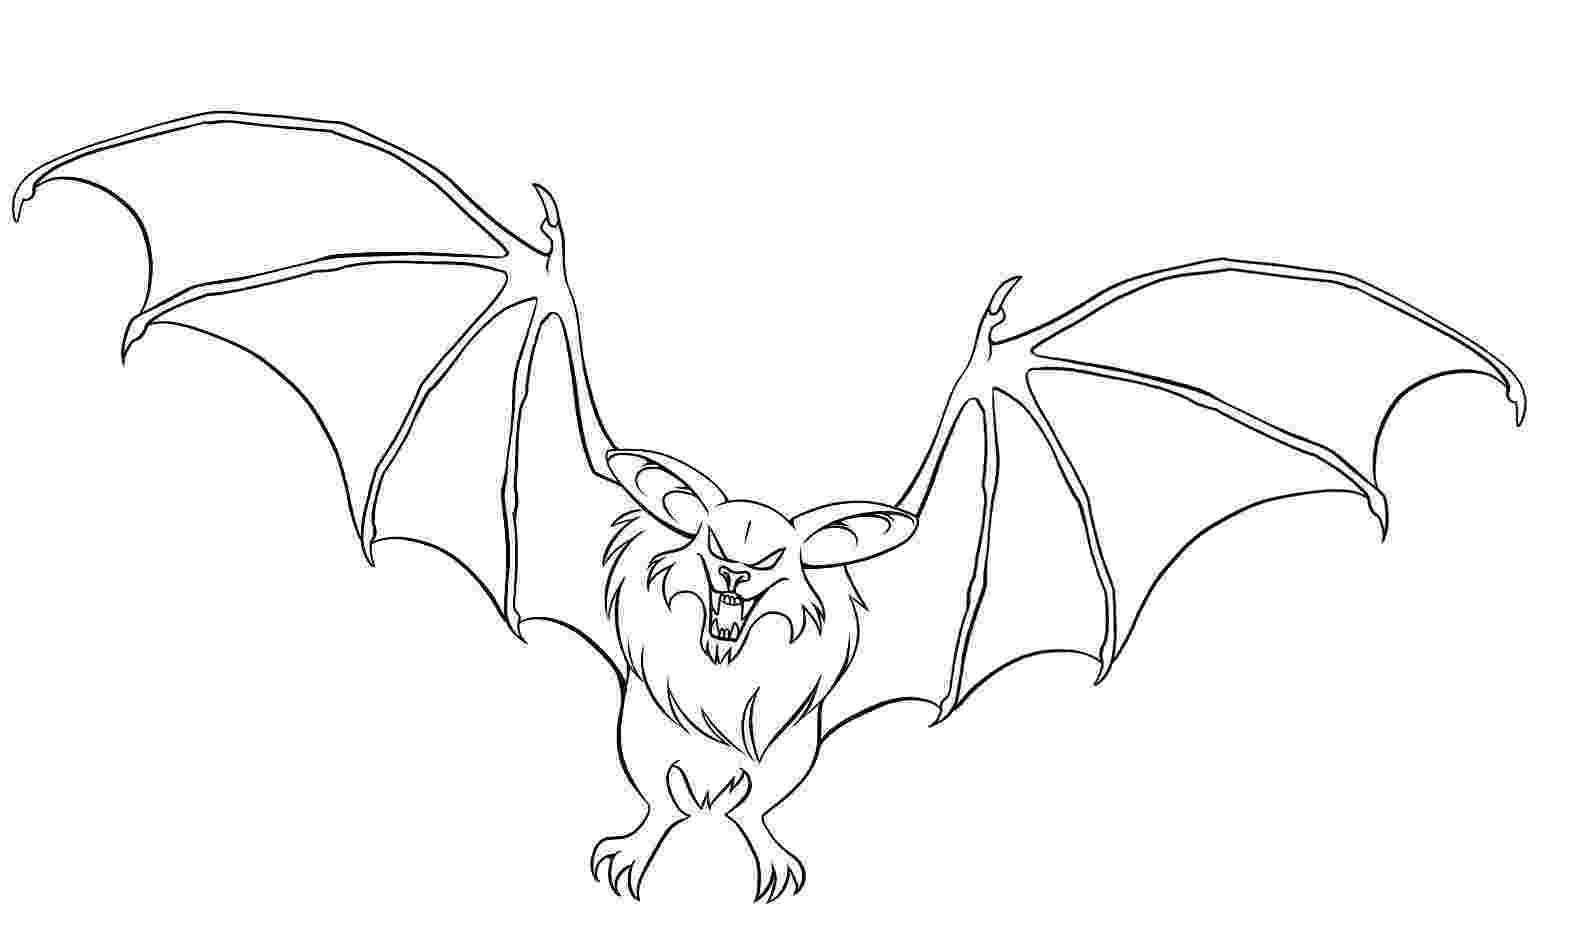 bats coloring pages free printable bat coloring pages for kids coloring pages bats